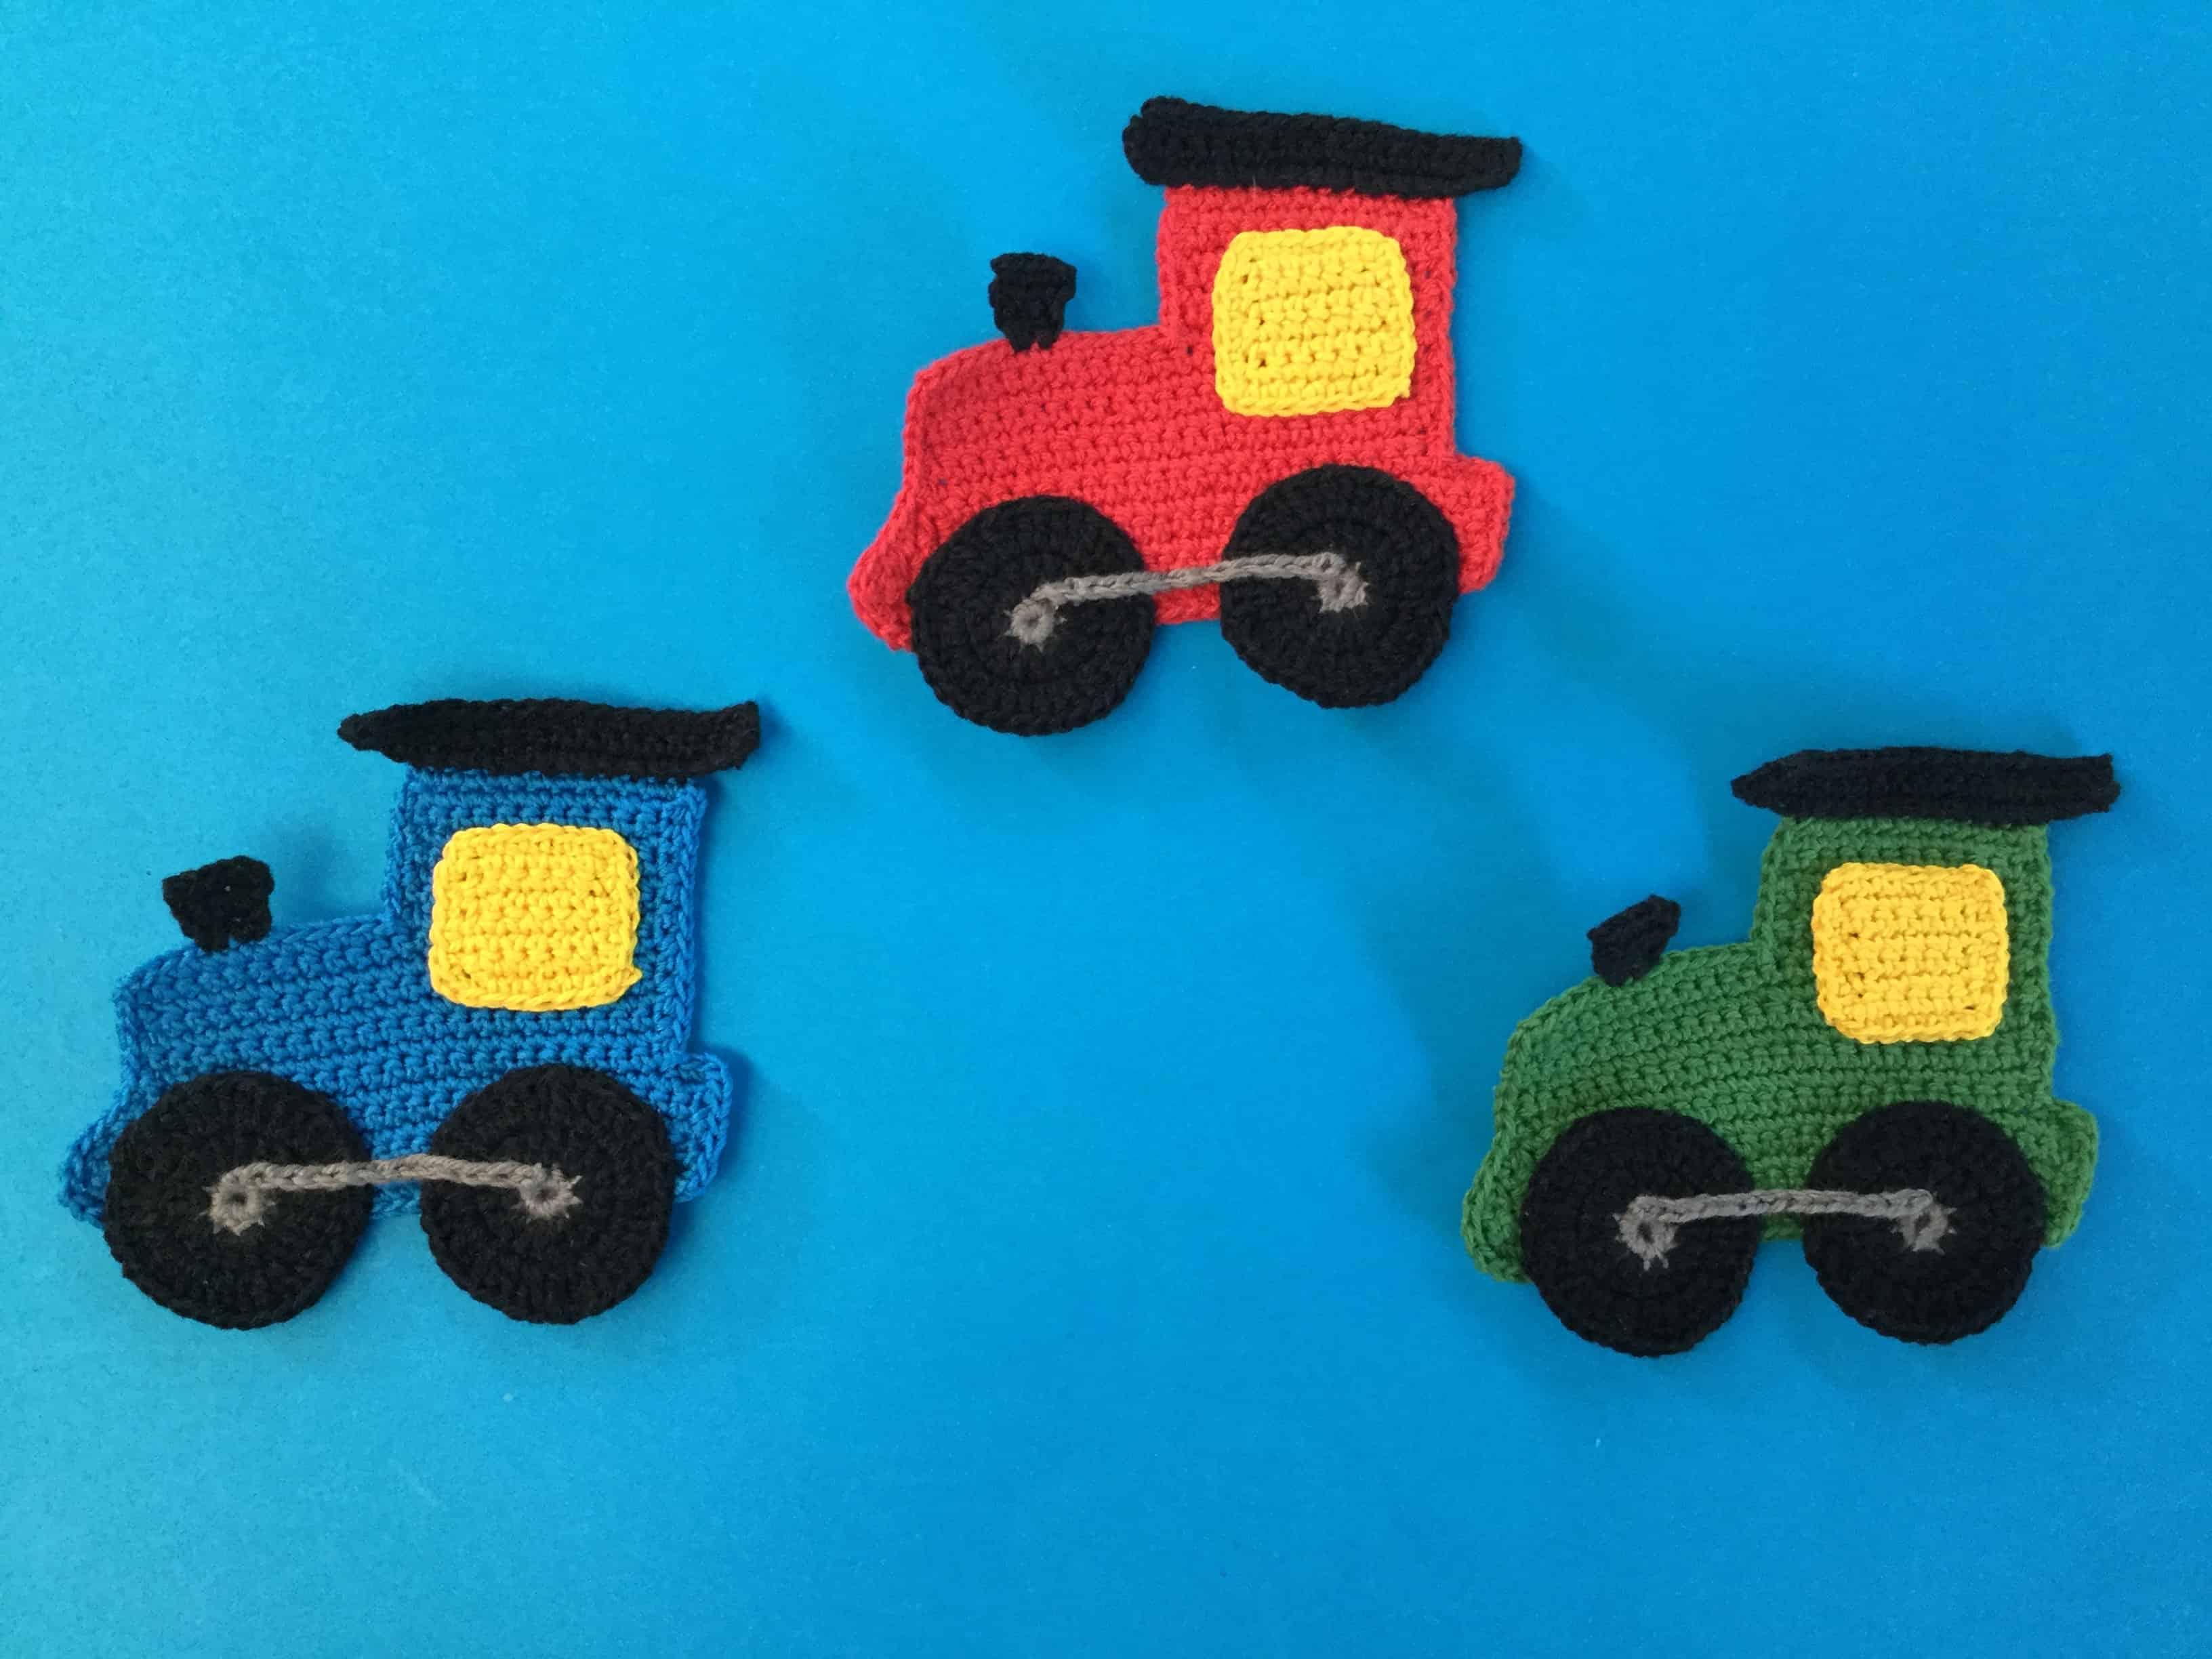 Finished crochet train engine group landscape